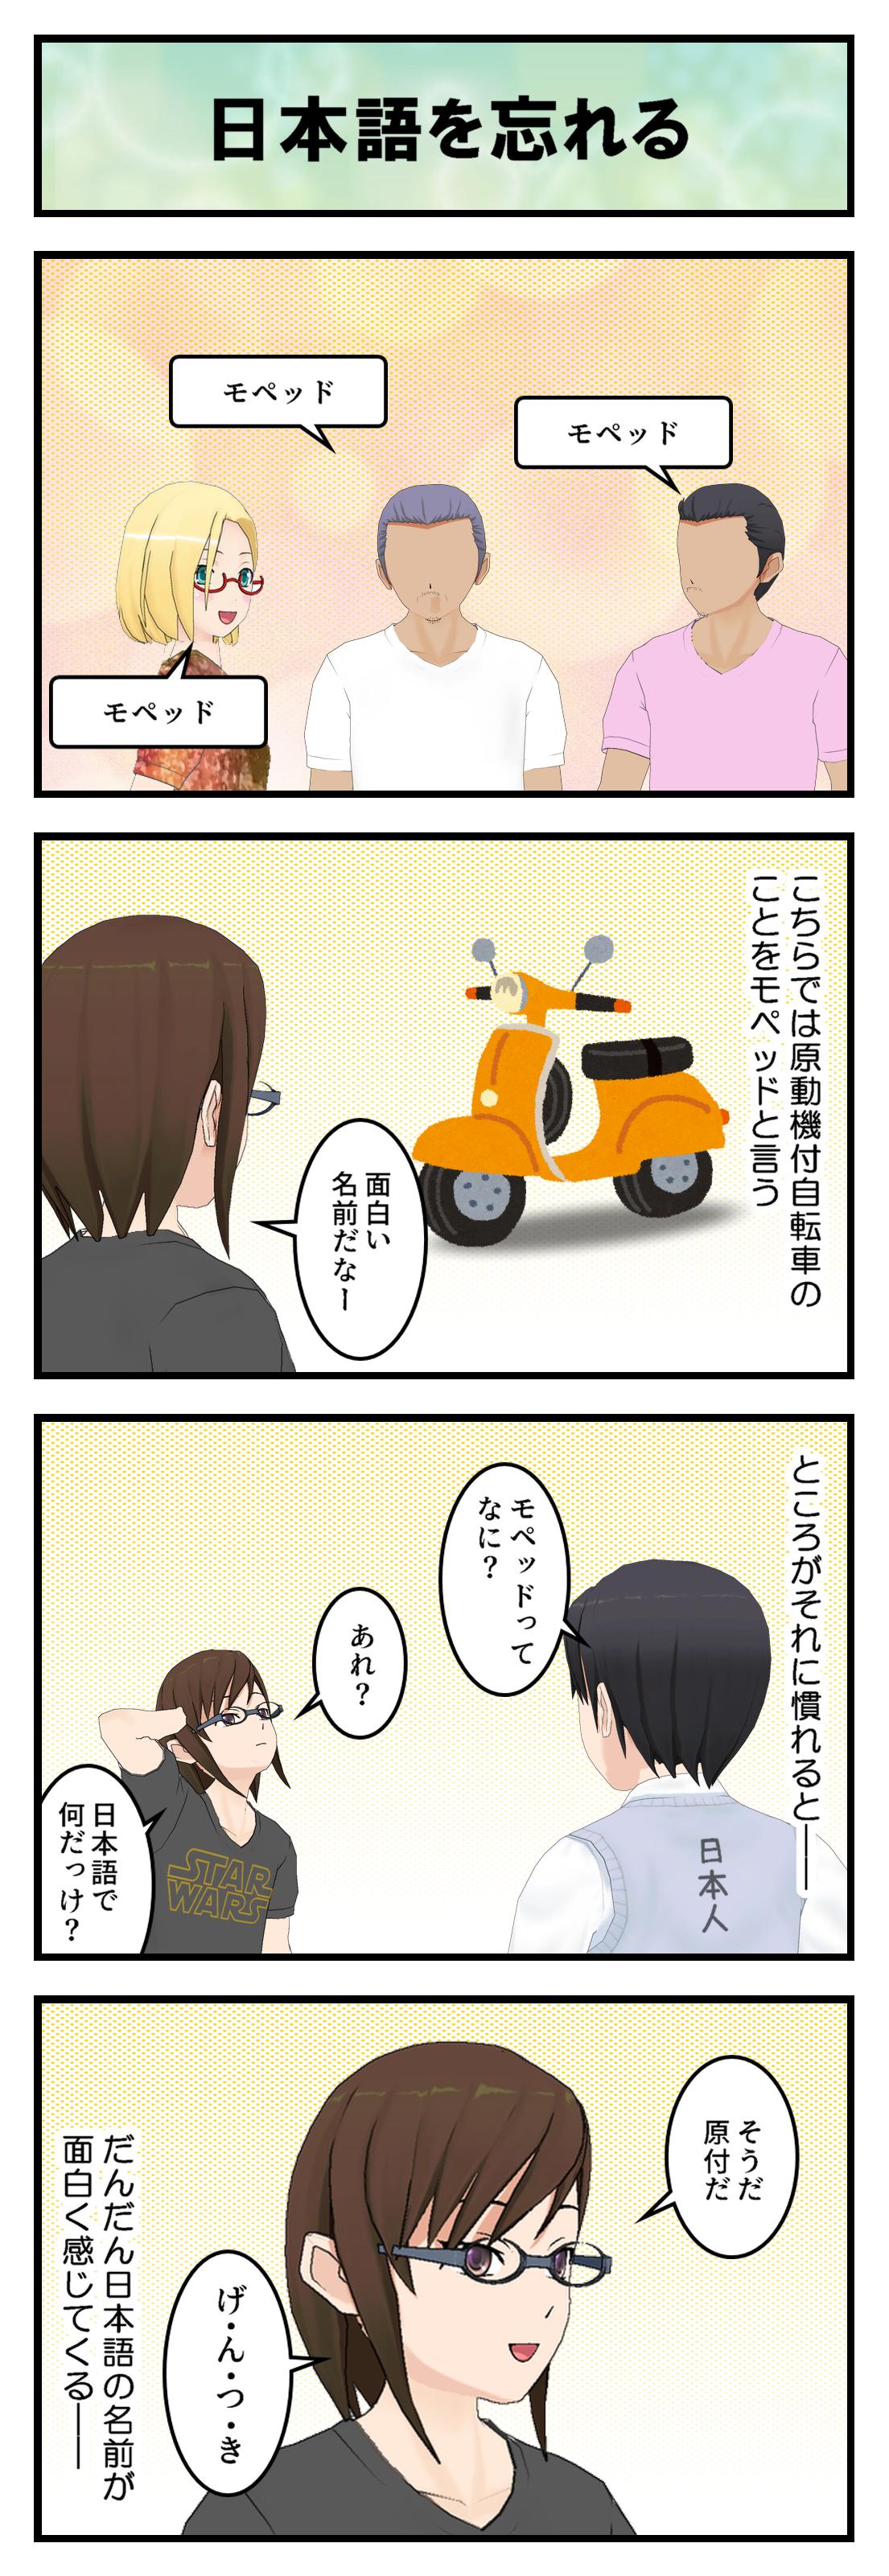 R279_日本語を忘れる_001